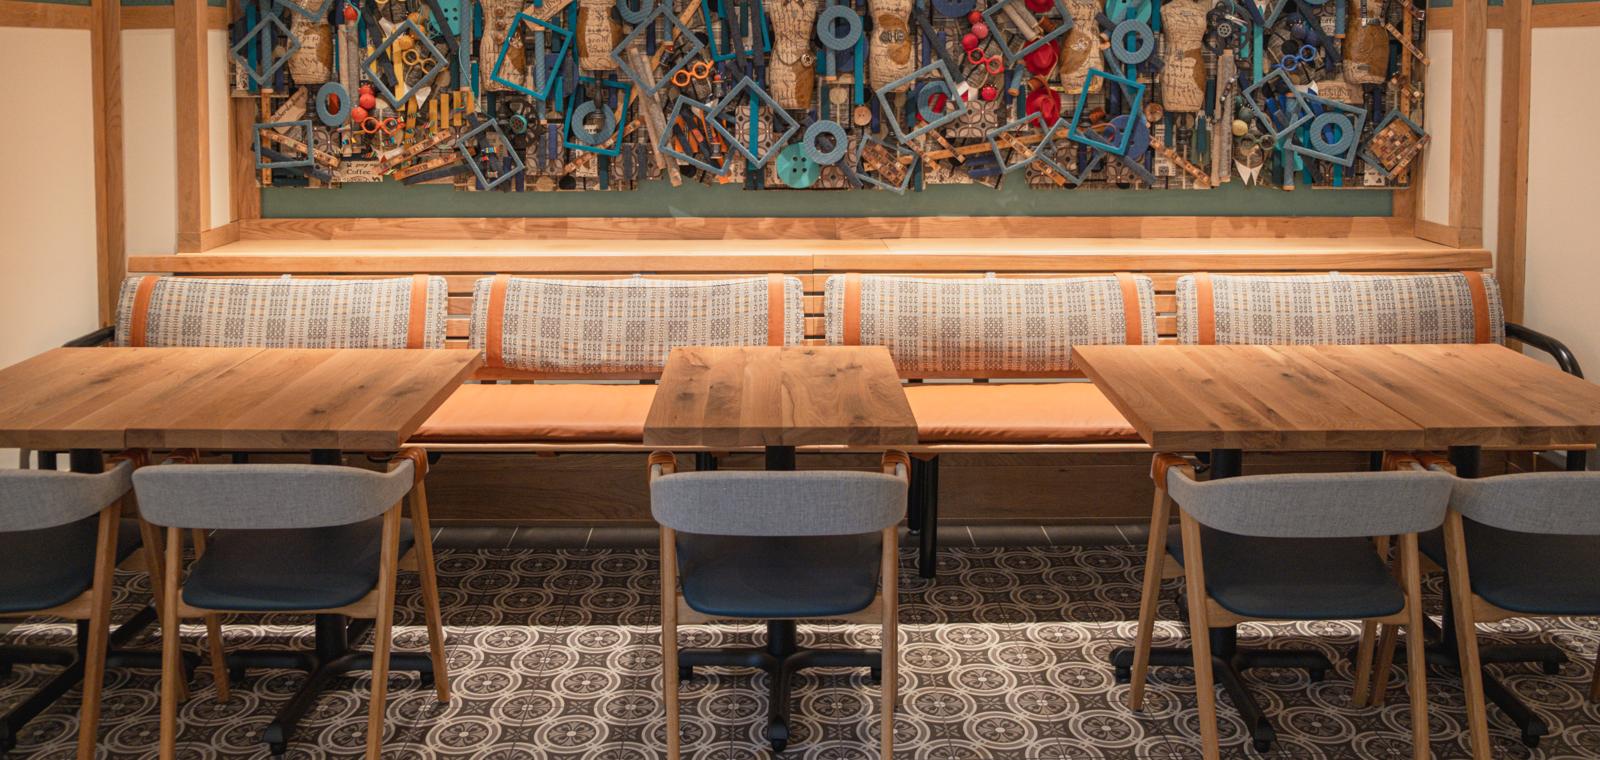 Dashery pre opening(Food & Bev, Interior)